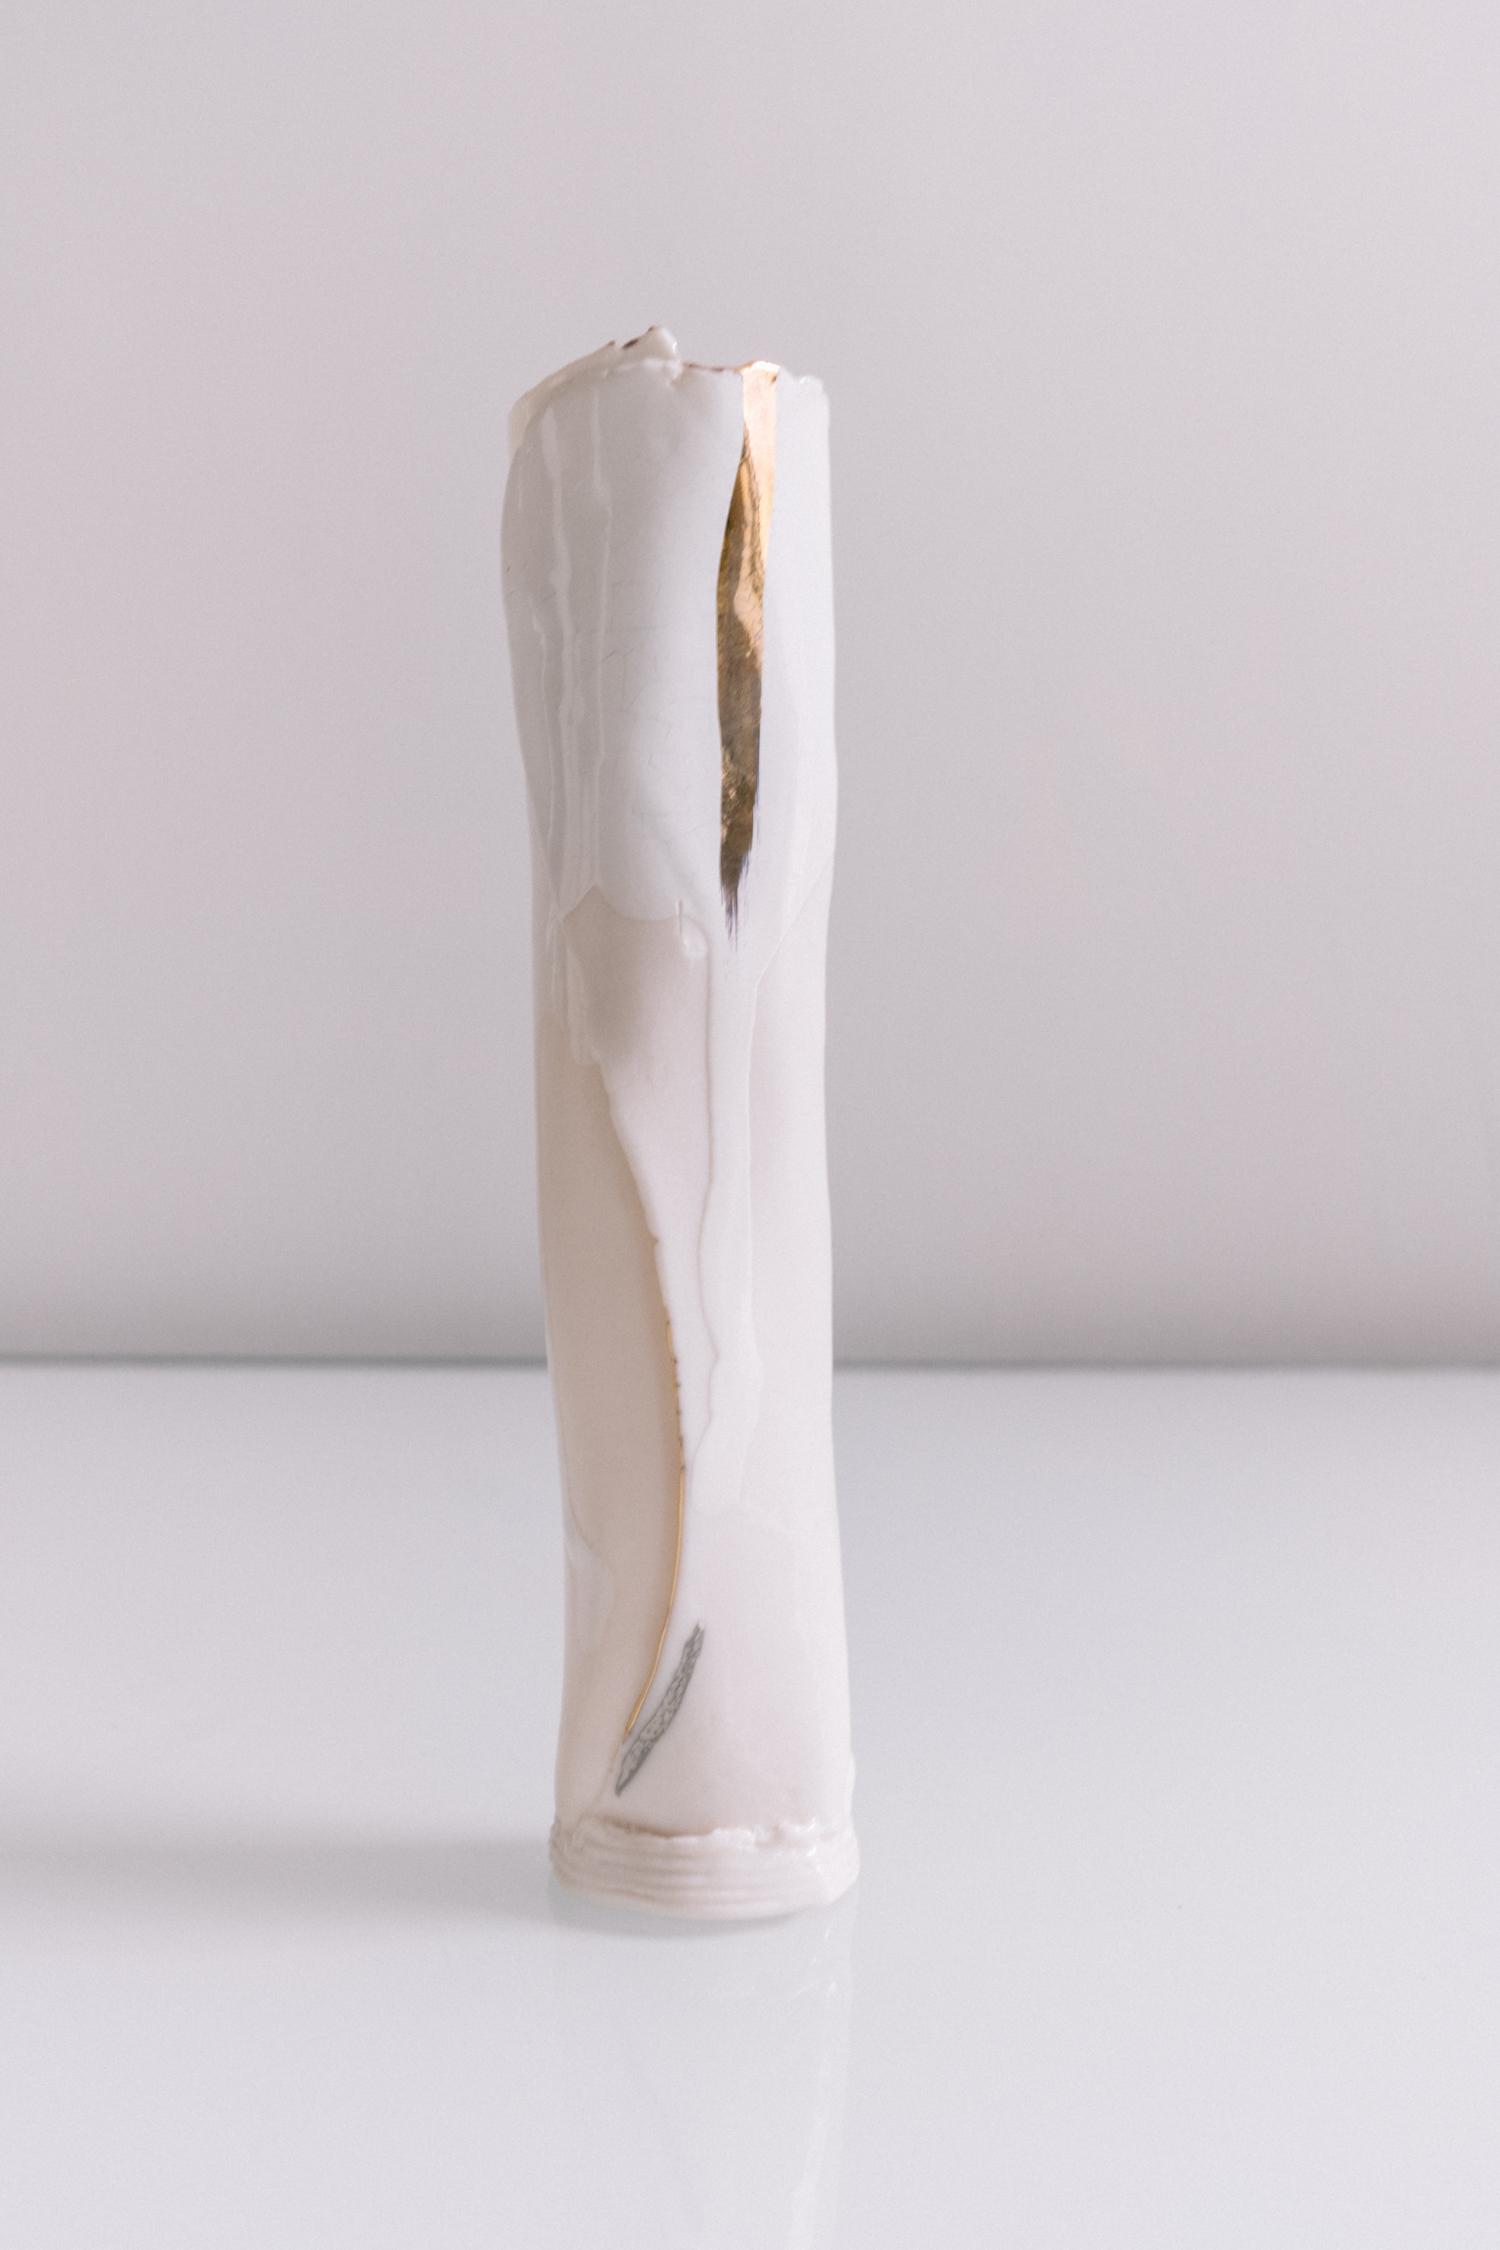 white vase 8 2.jpg